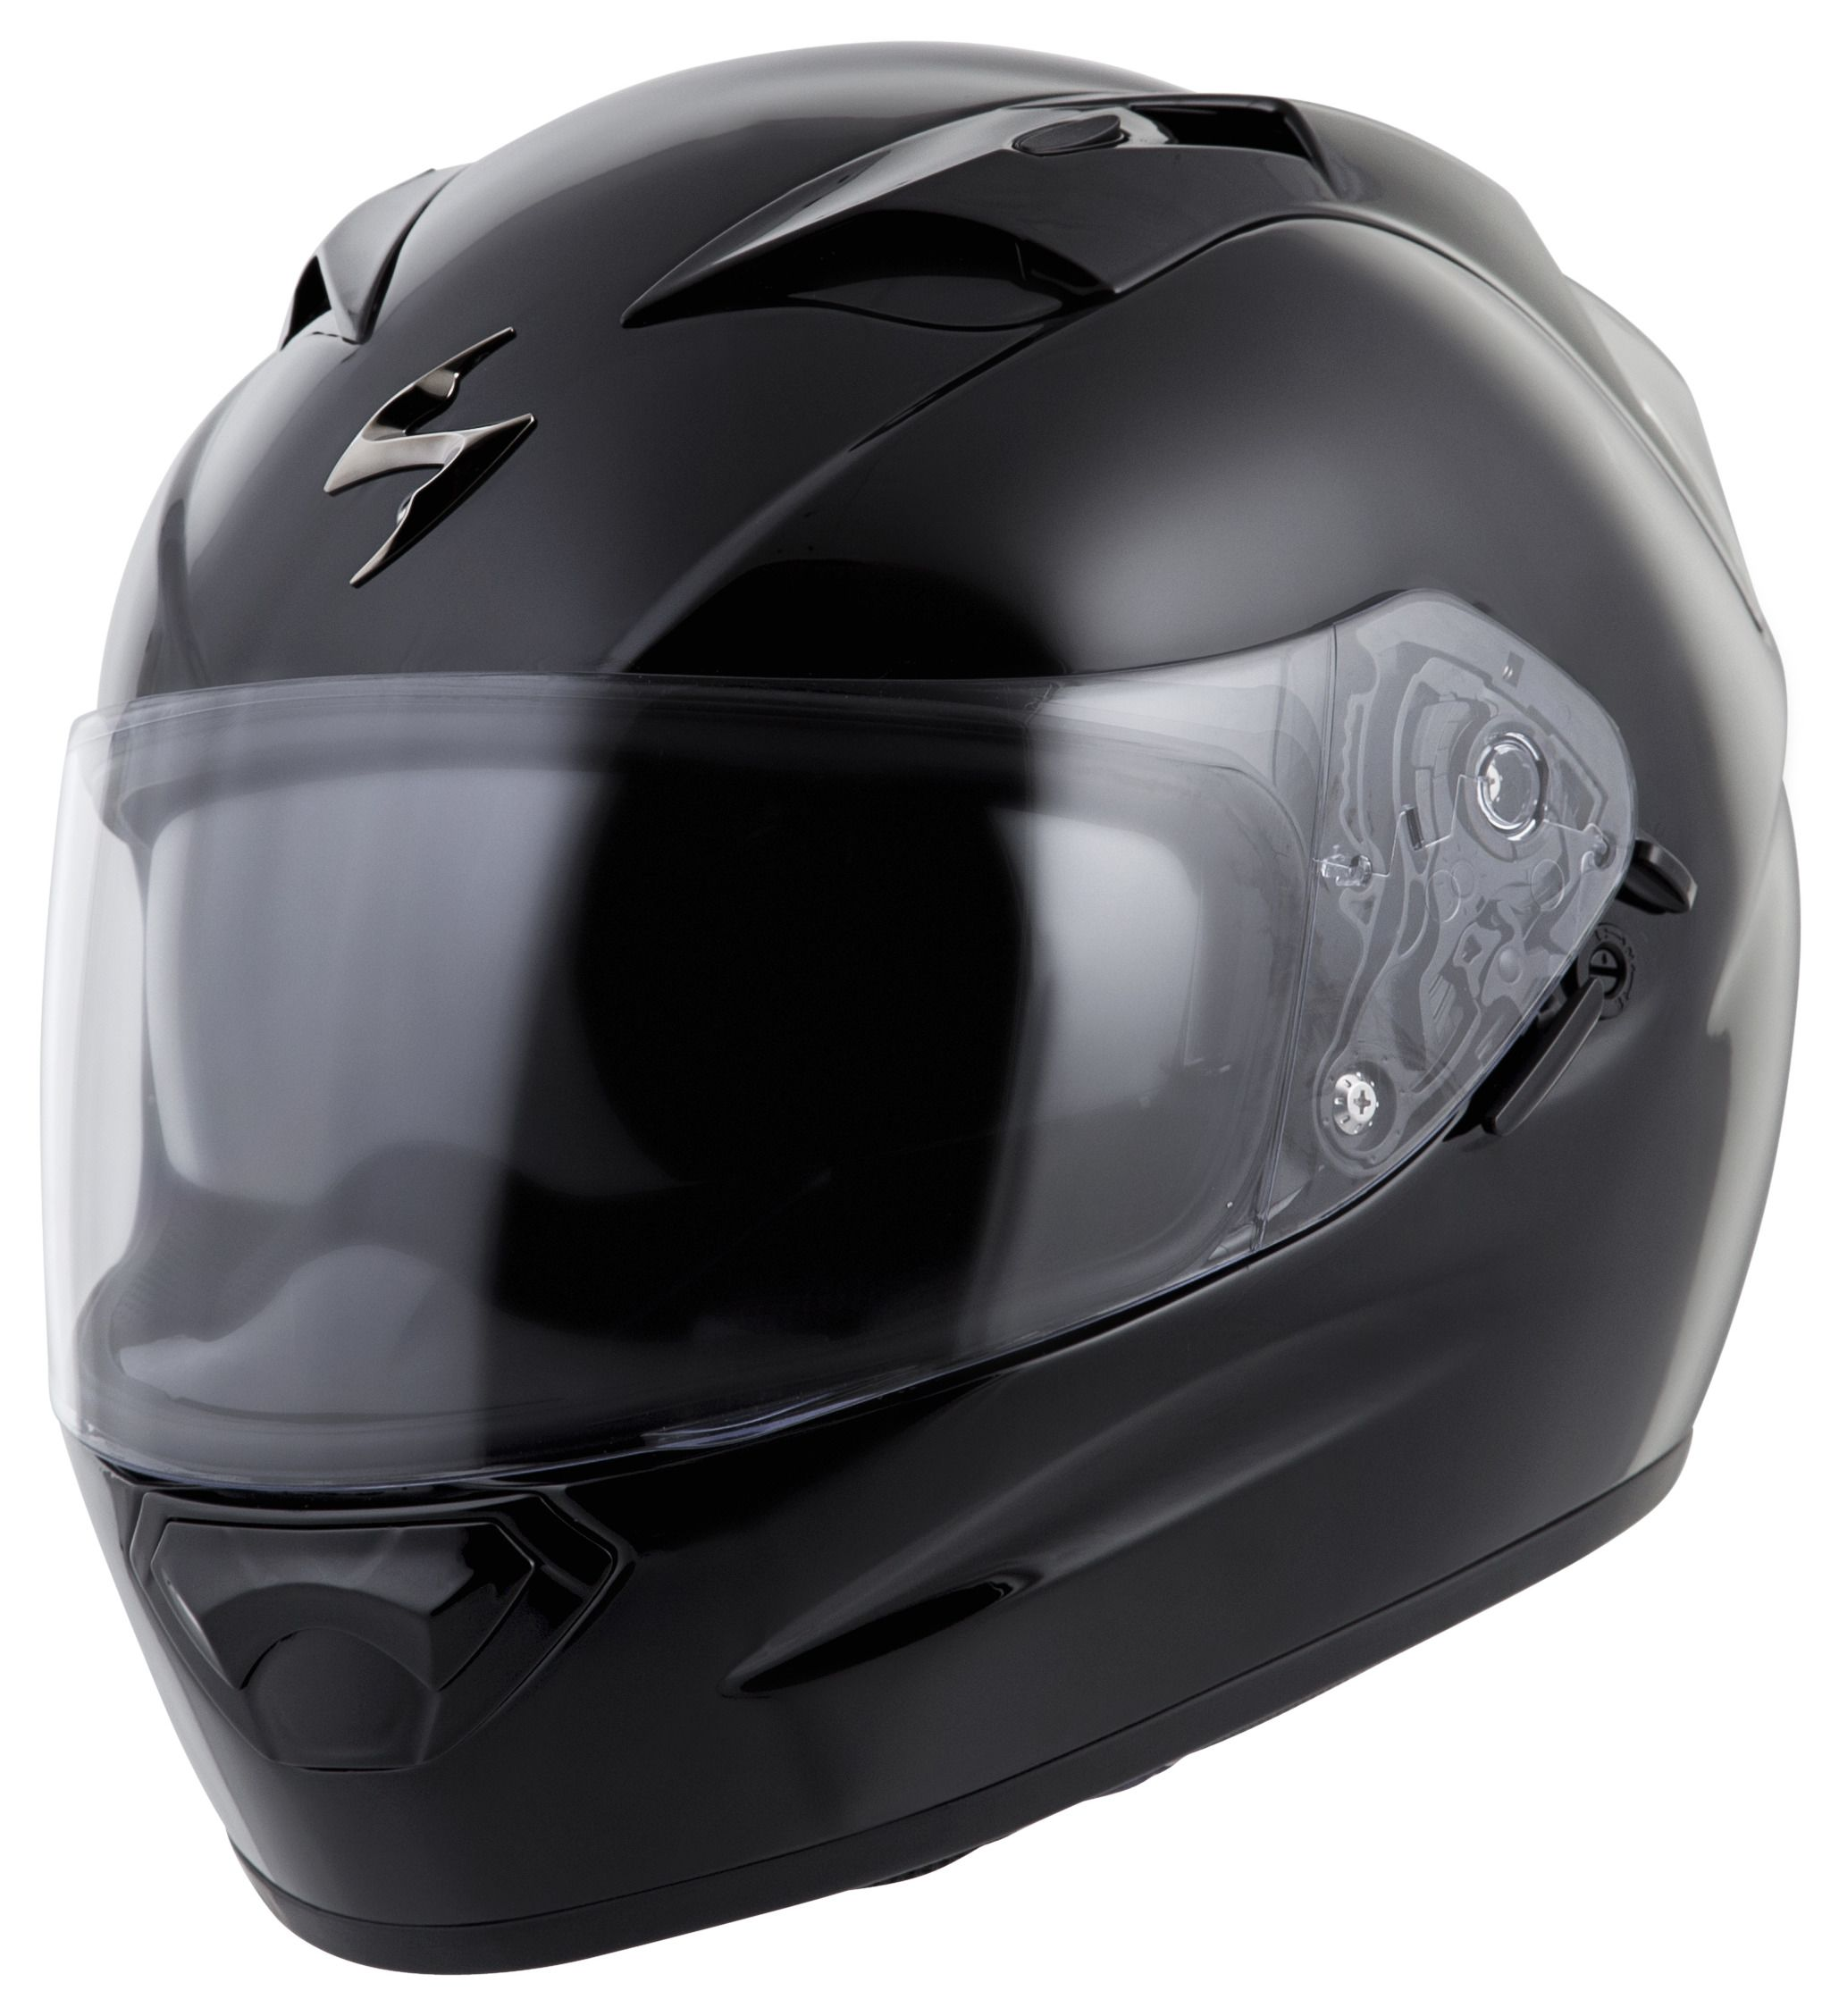 scorpion exo t1200 helmet solid revzilla. Black Bedroom Furniture Sets. Home Design Ideas